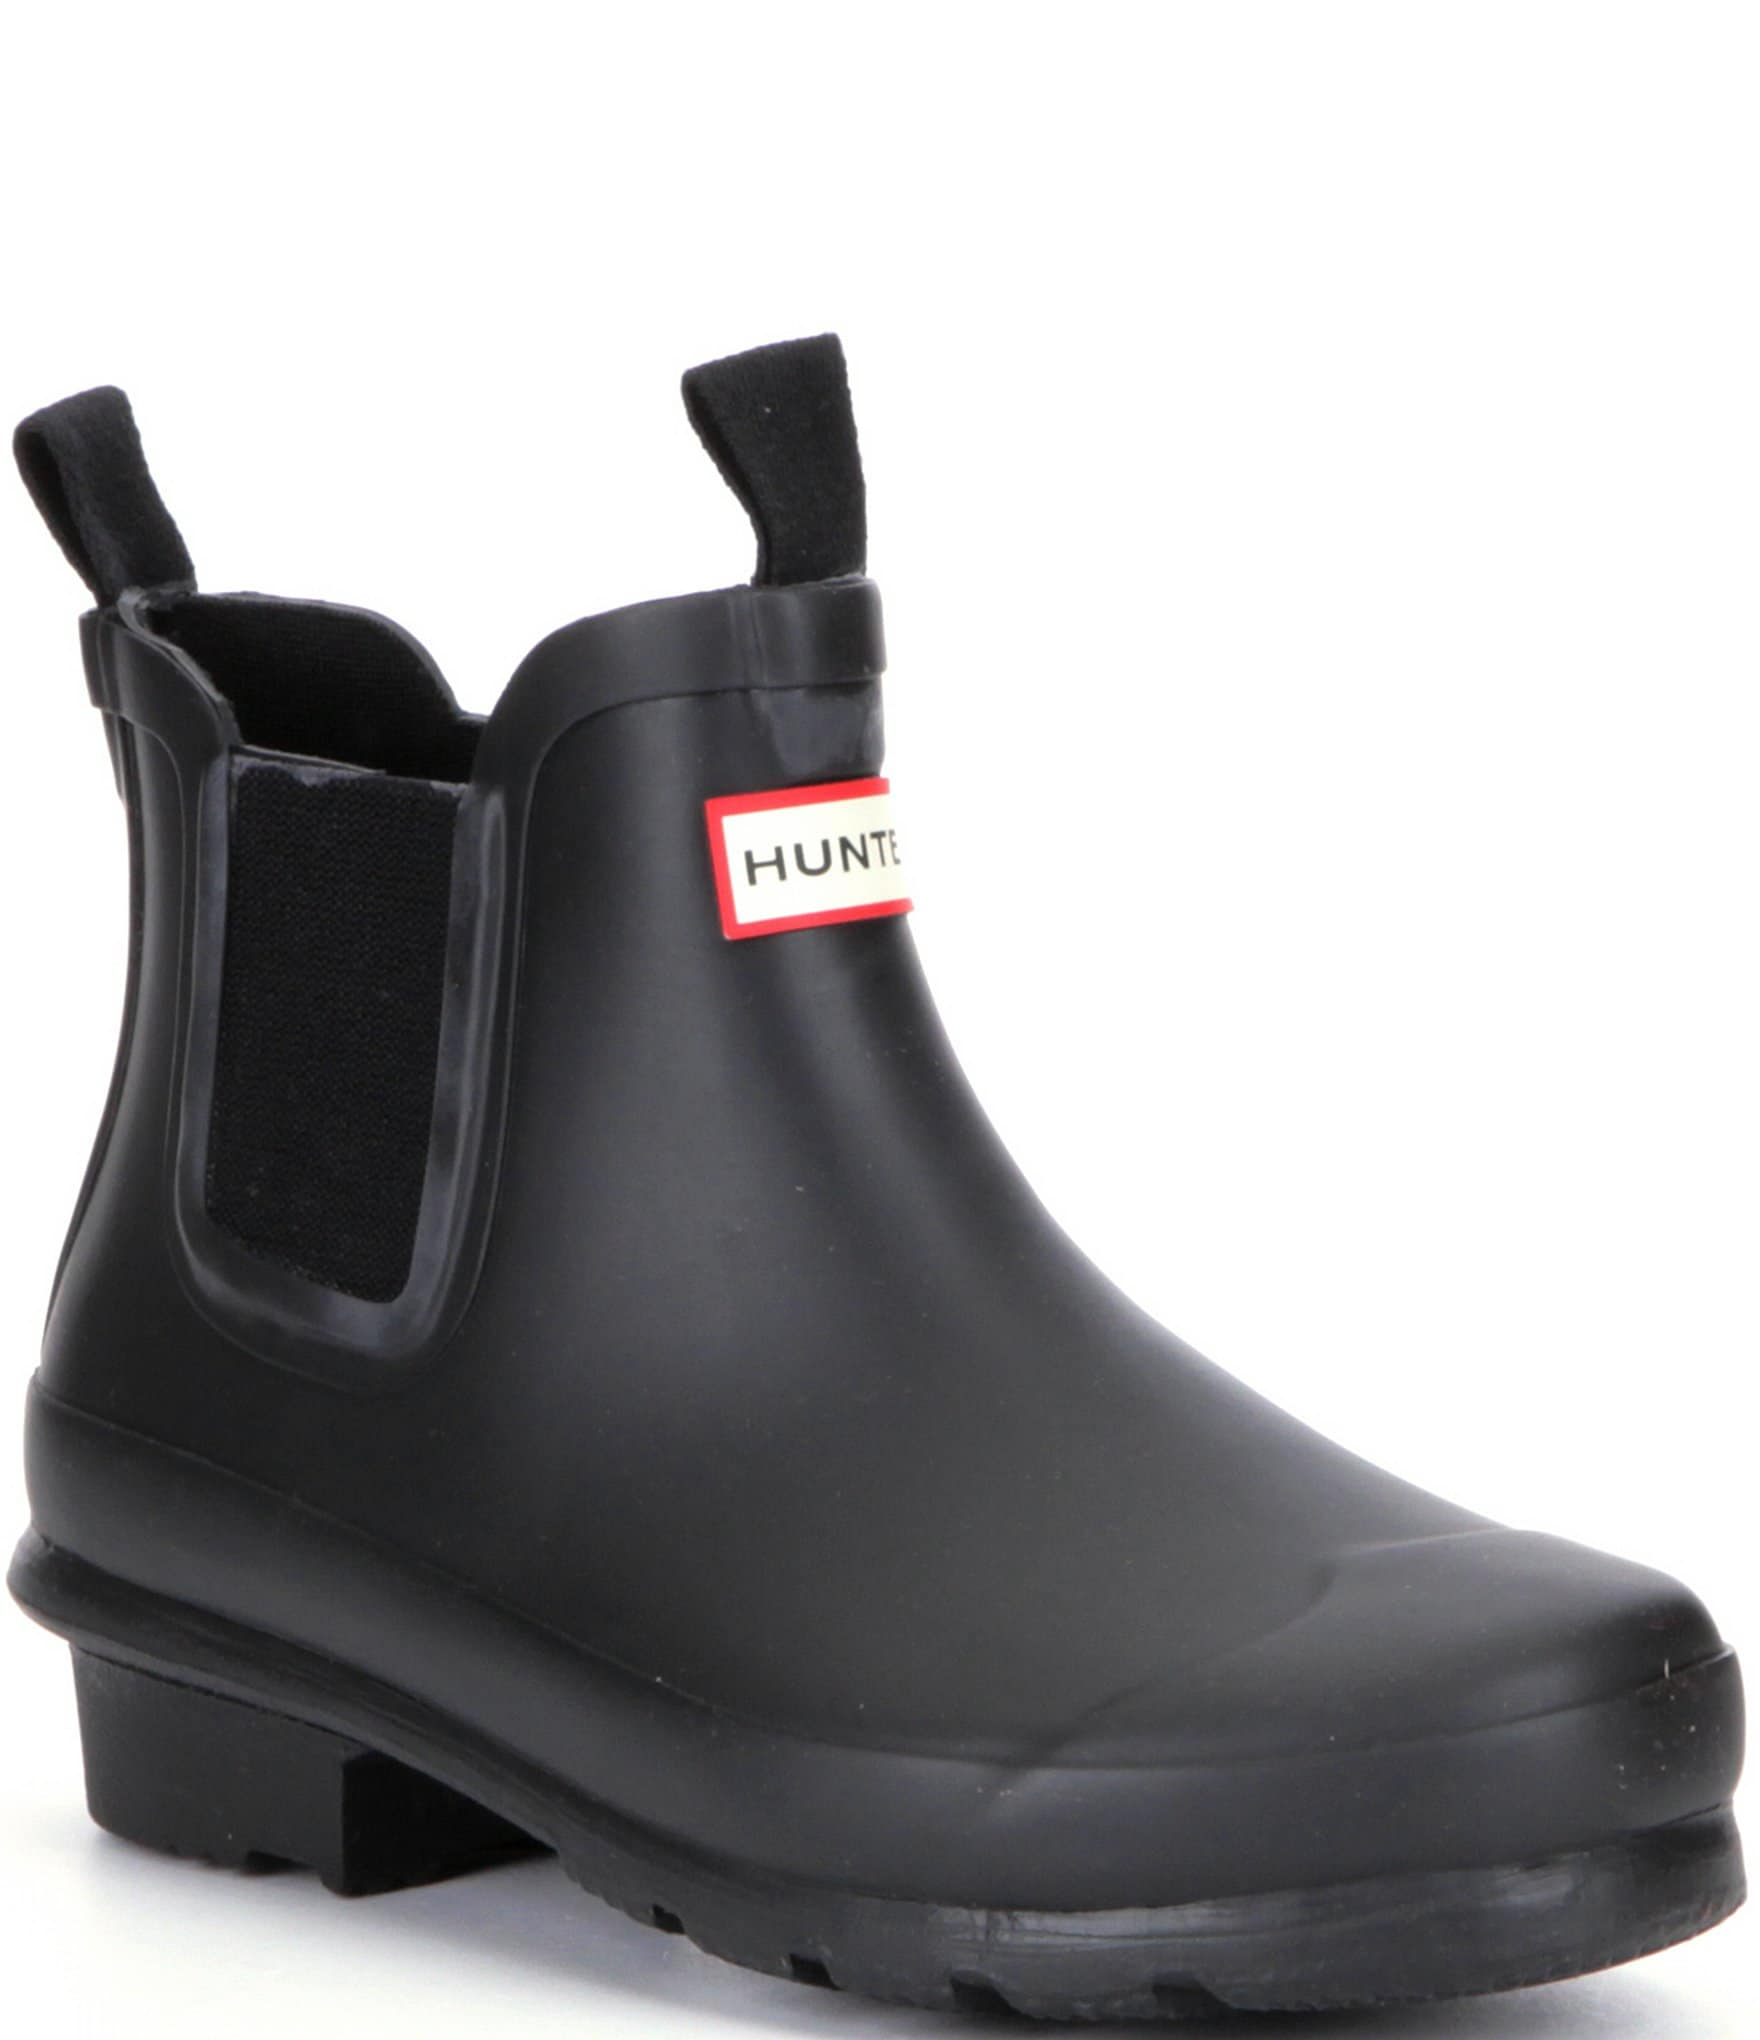 6d859010d9b0 Hunter Shoes